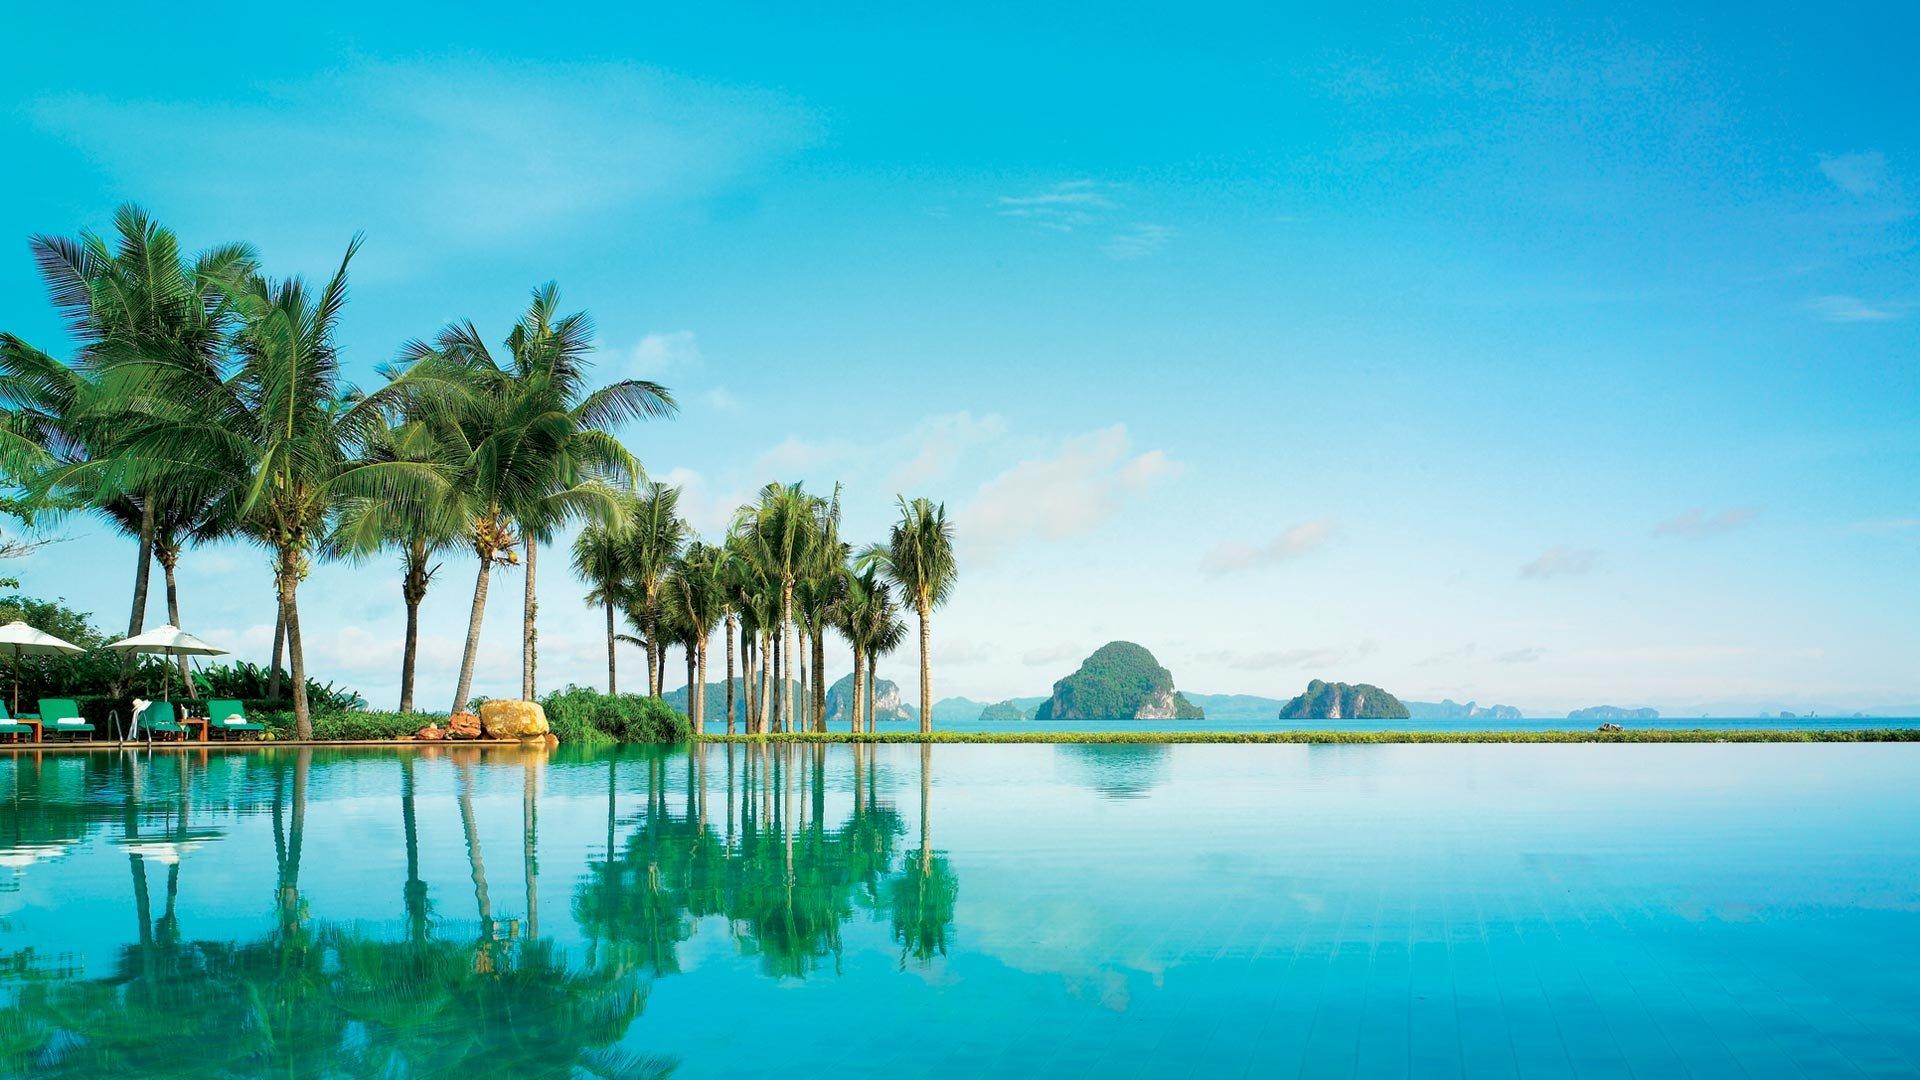 Phulay Bay Luxury Resort Thailand Hd Wallpaper